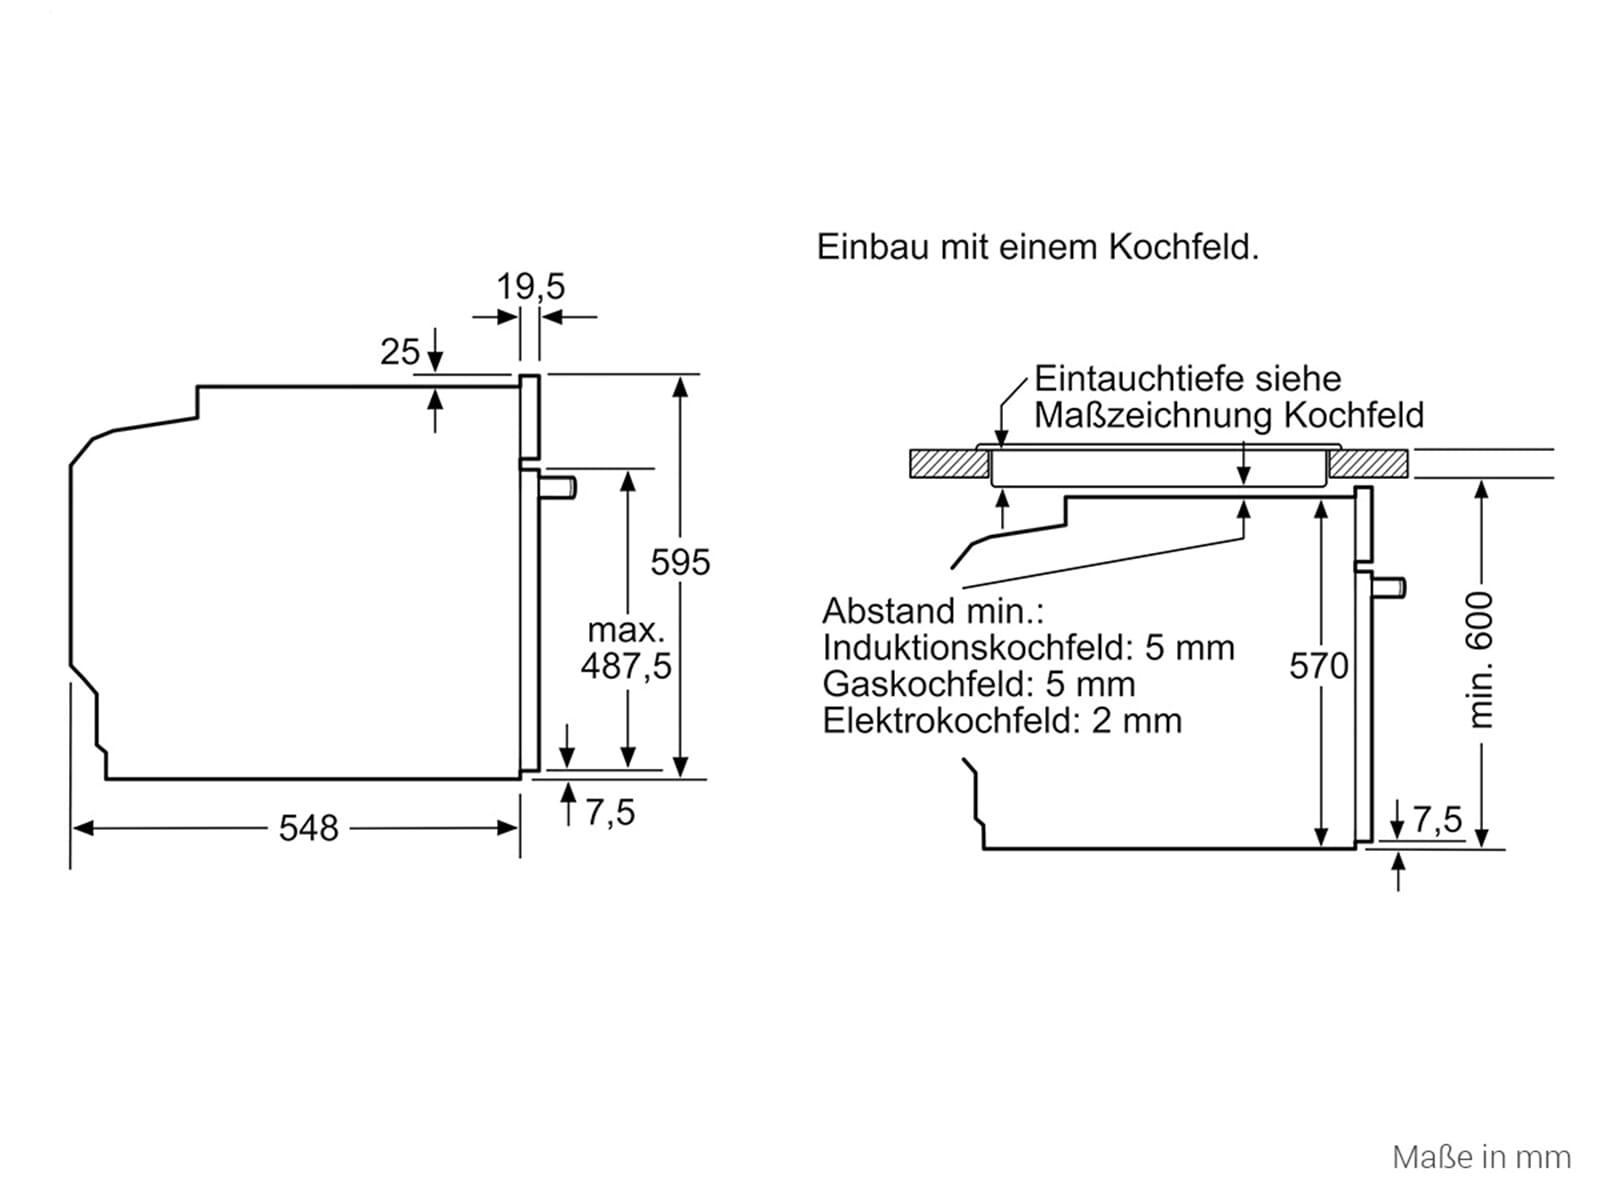 Siemens HE510ABR0 Einbauherd Edelstahl